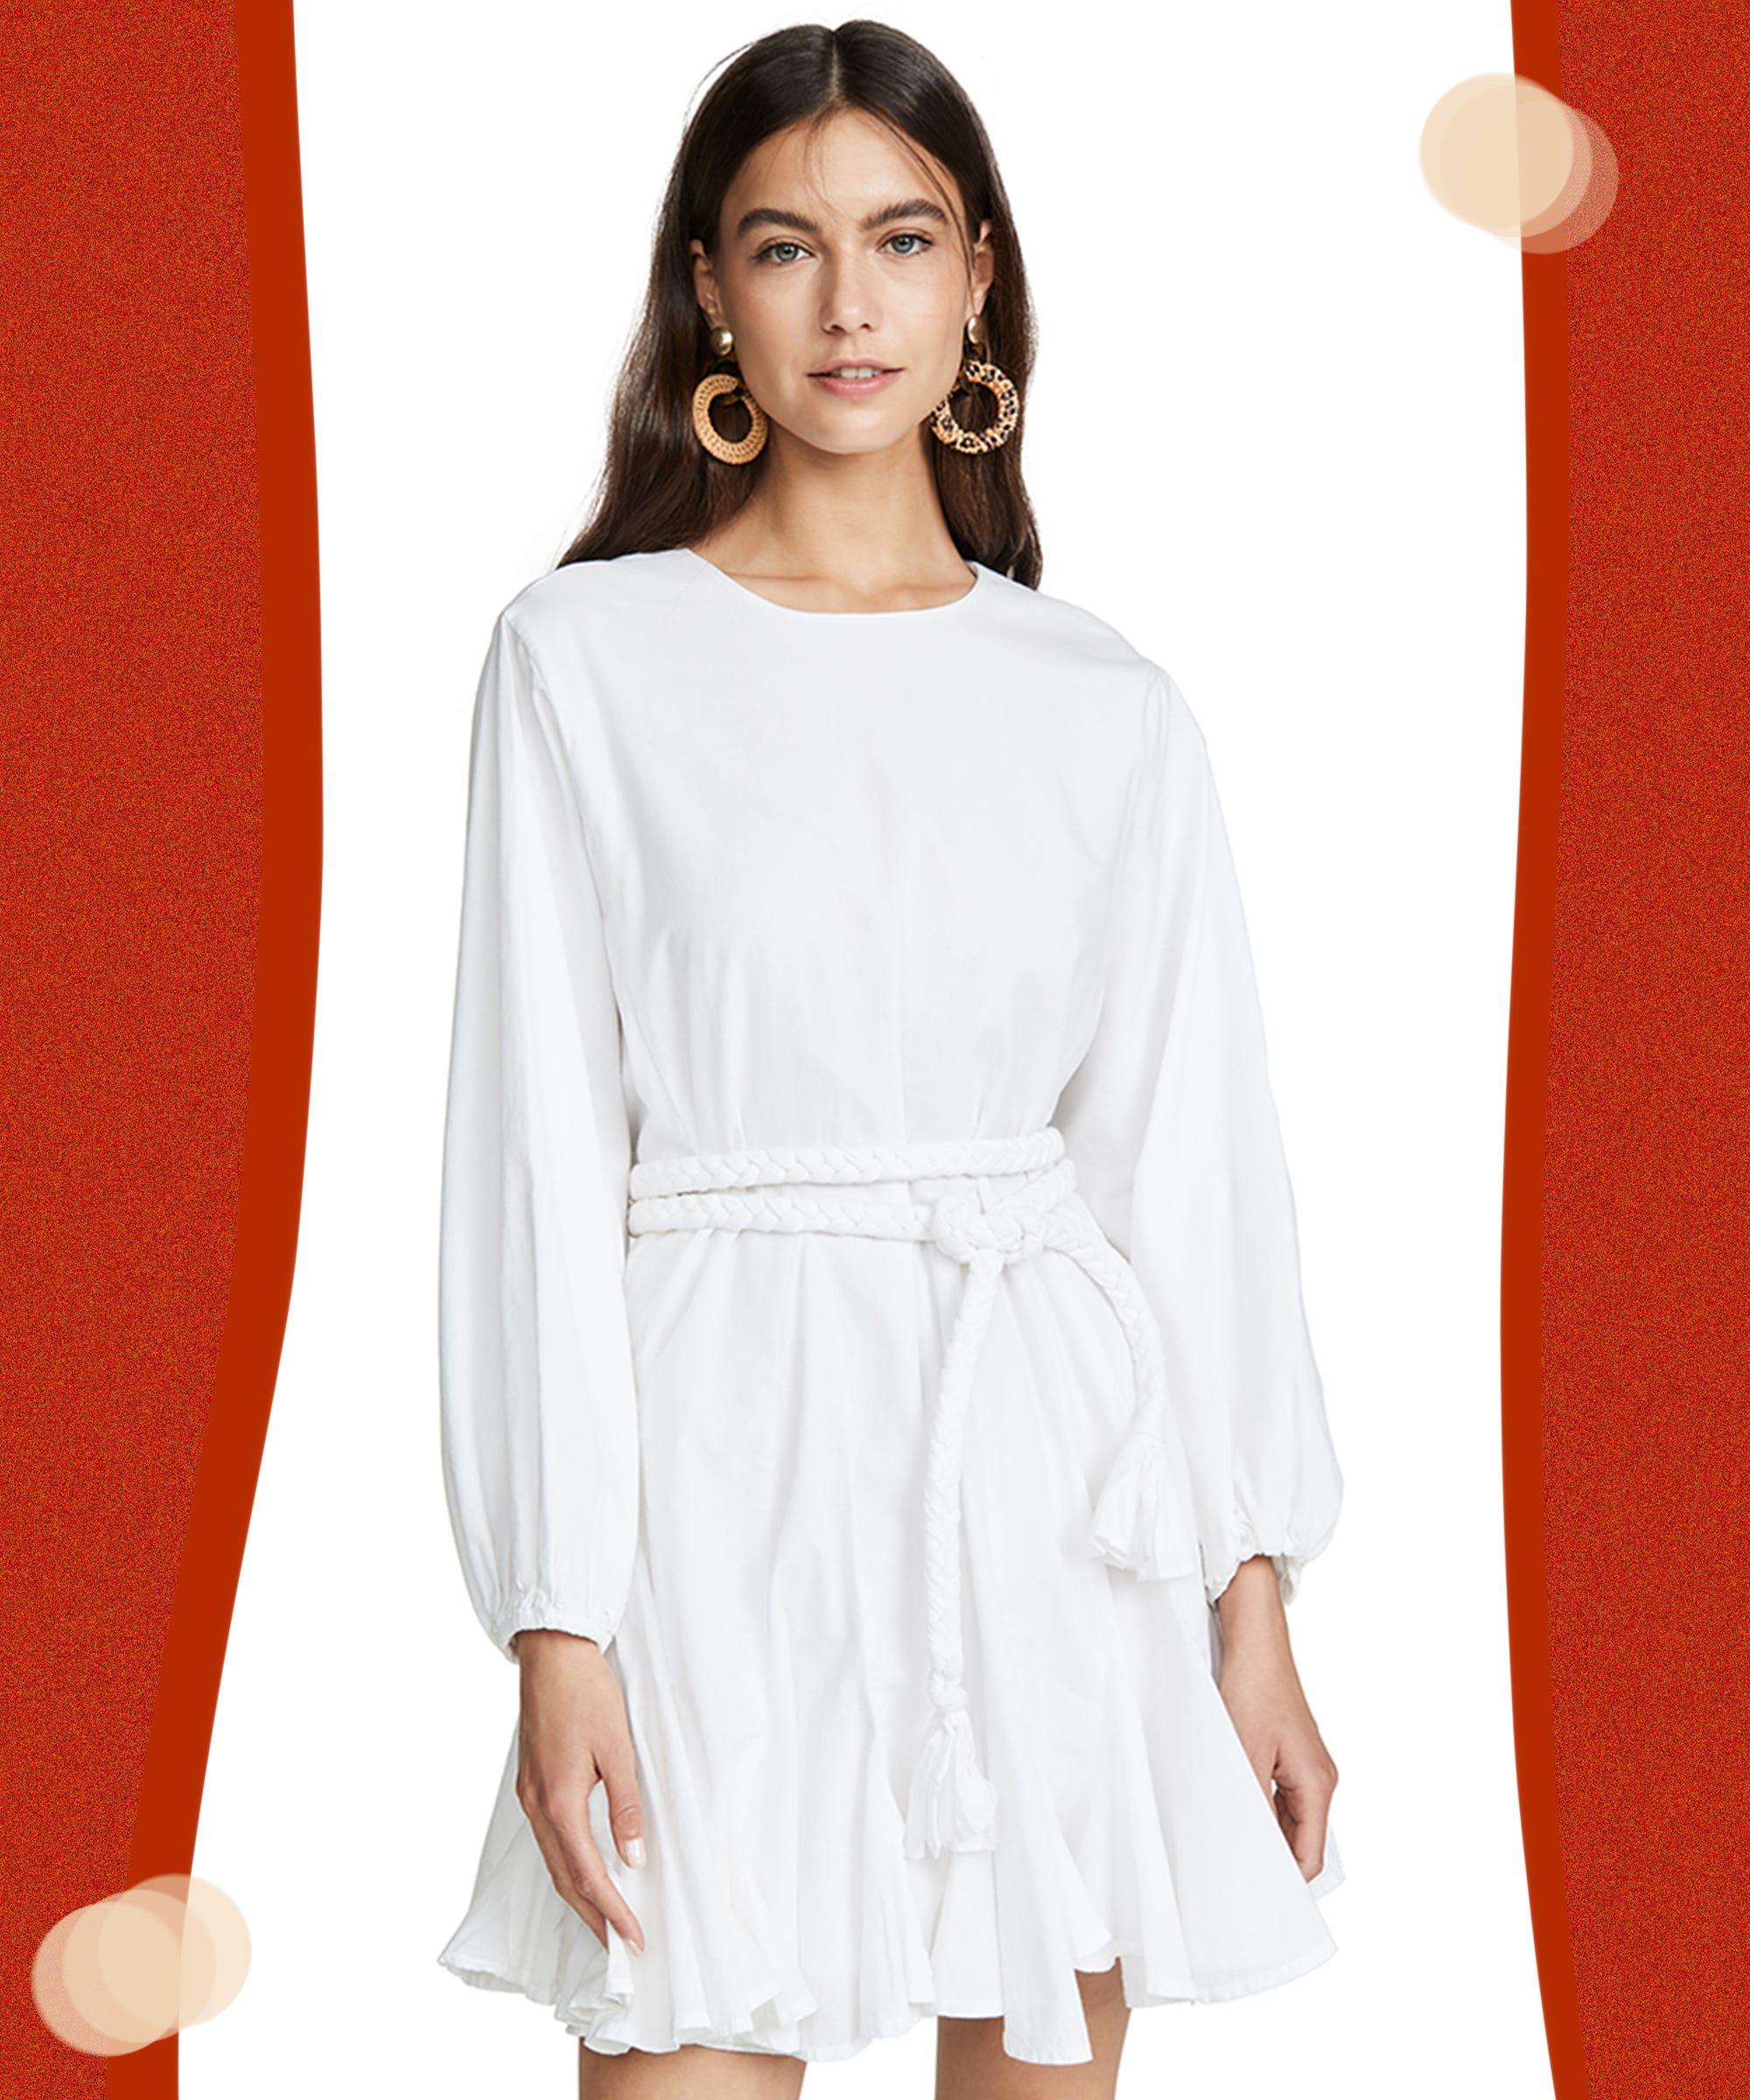 e8e98a9775b Long Sleeve Summer Dresses Target - Gomes Weine AG